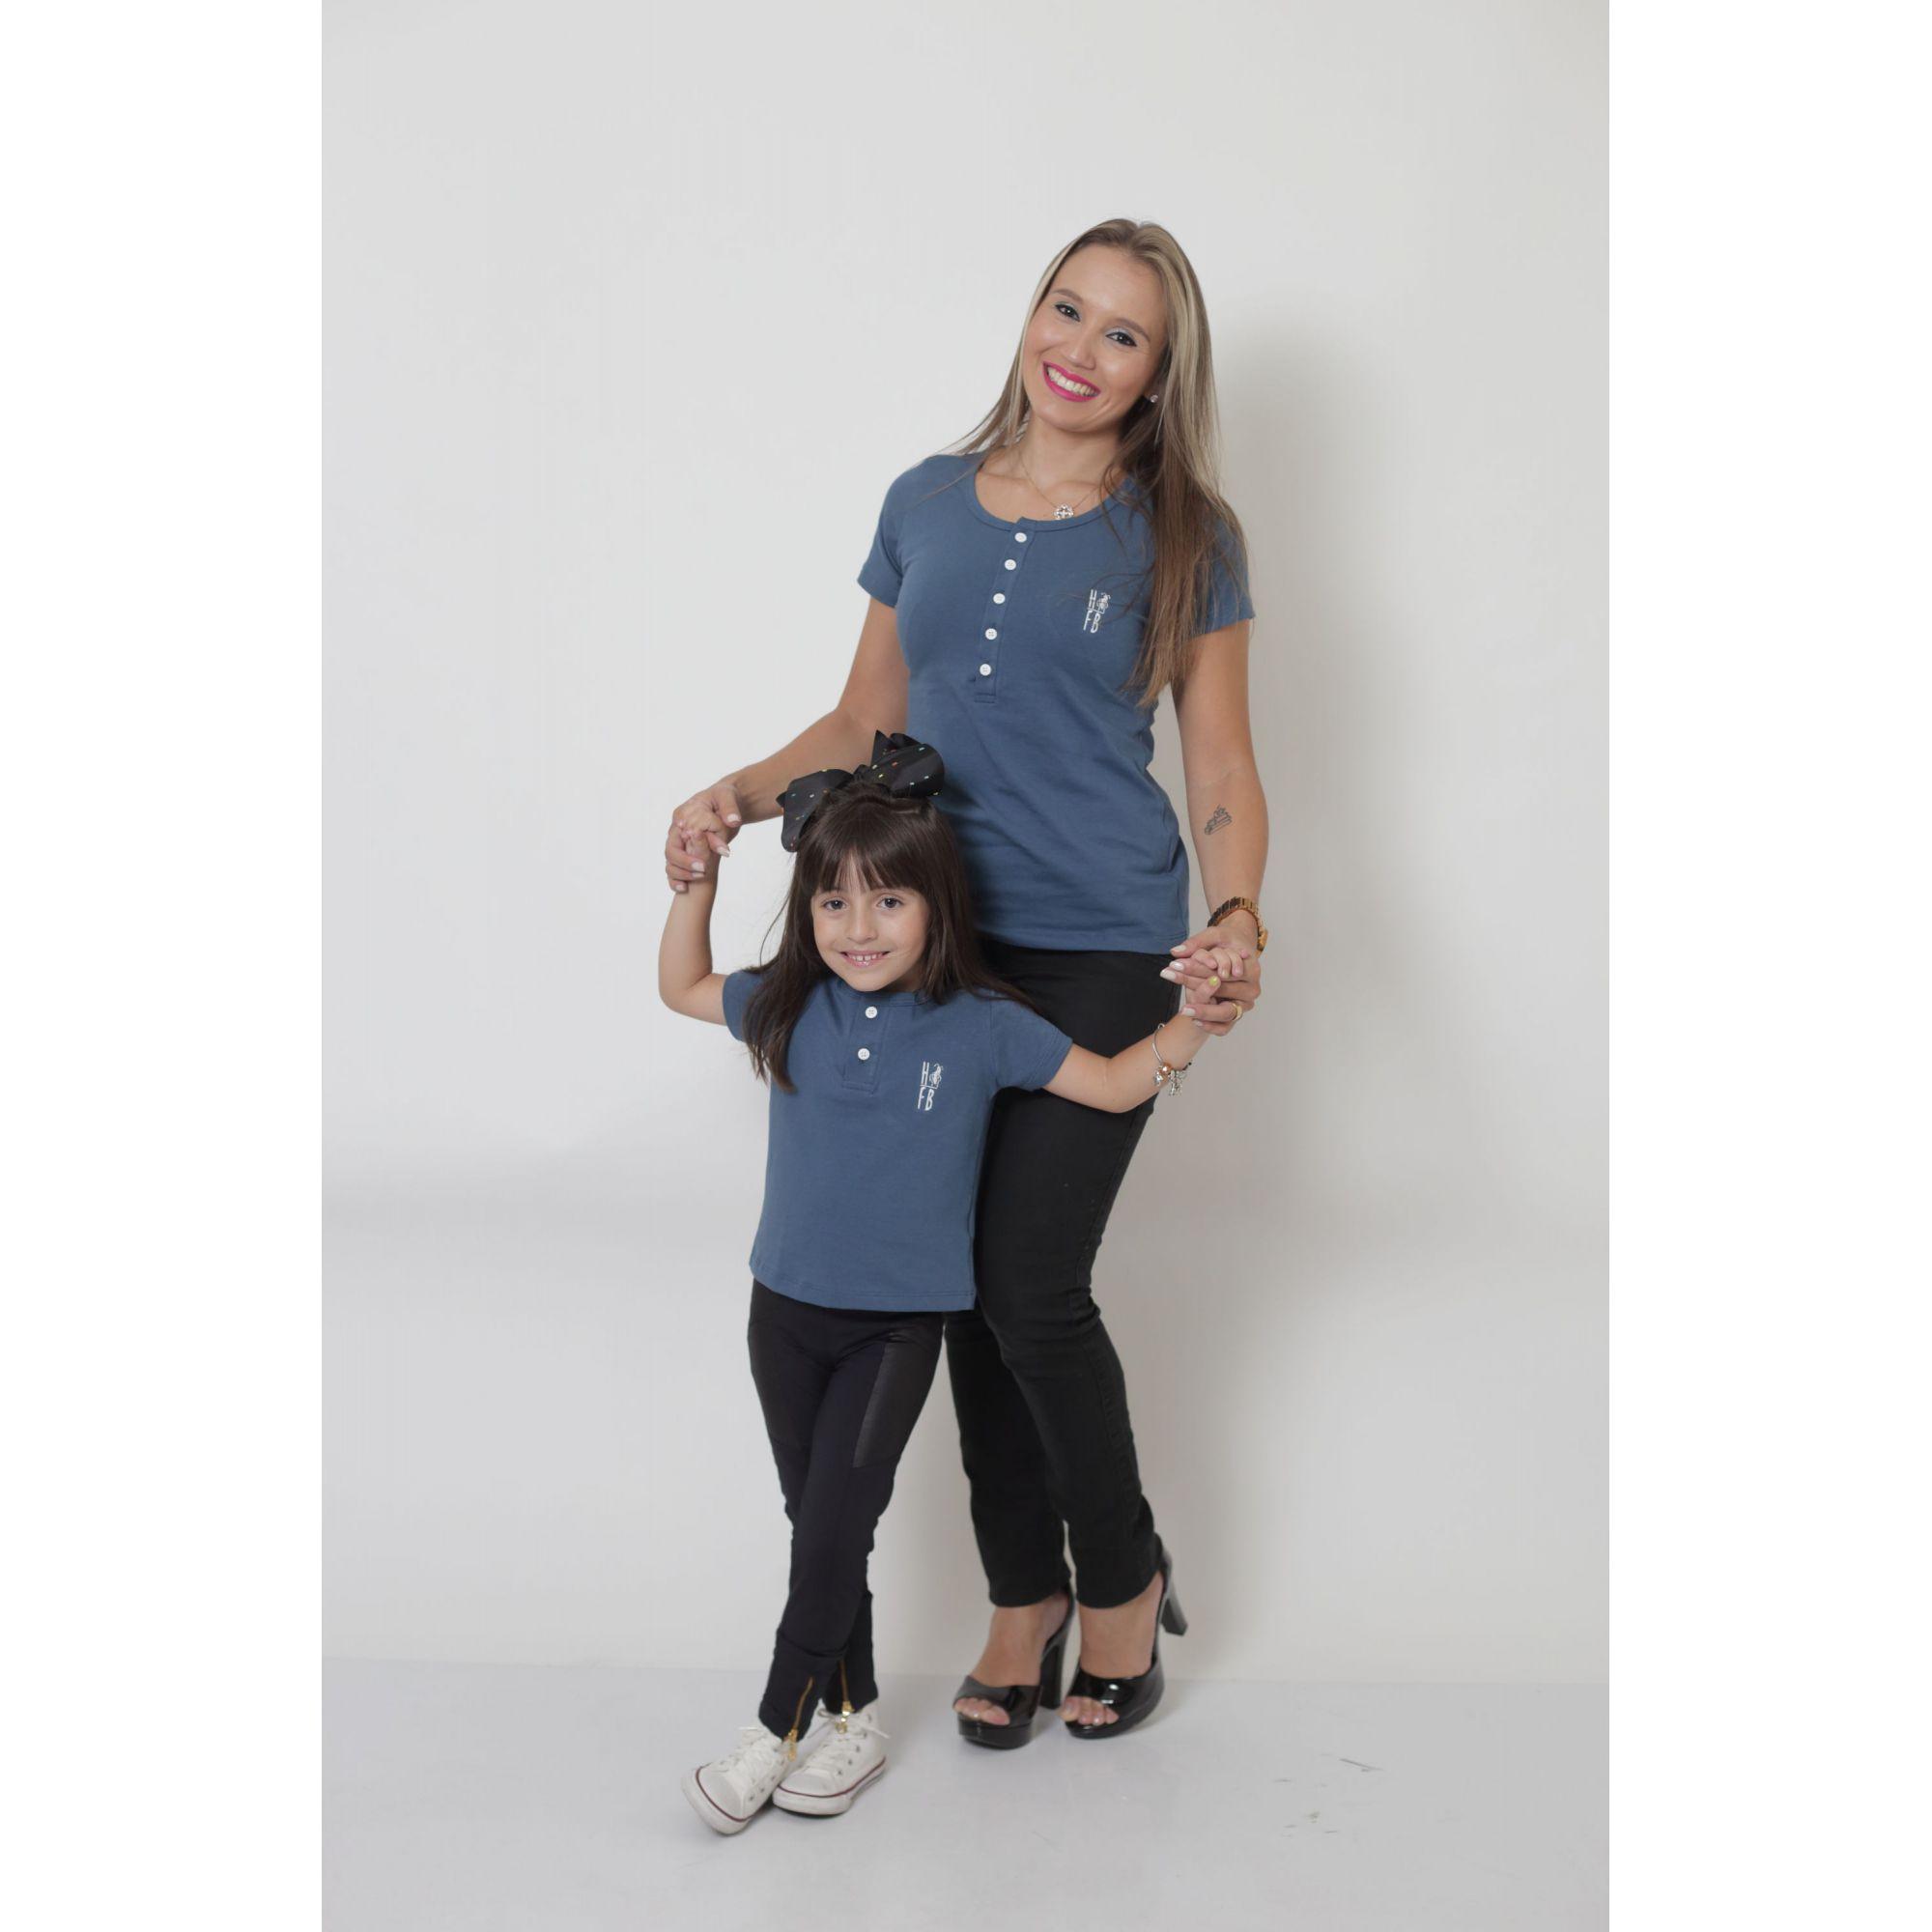 MÃE E FILHO > Kit 02 Peças T-Shirts ou Body Henley - Azul Petróleo [Coleção Tal Mãe Tal Filho]  - Heitor Fashion Brazil